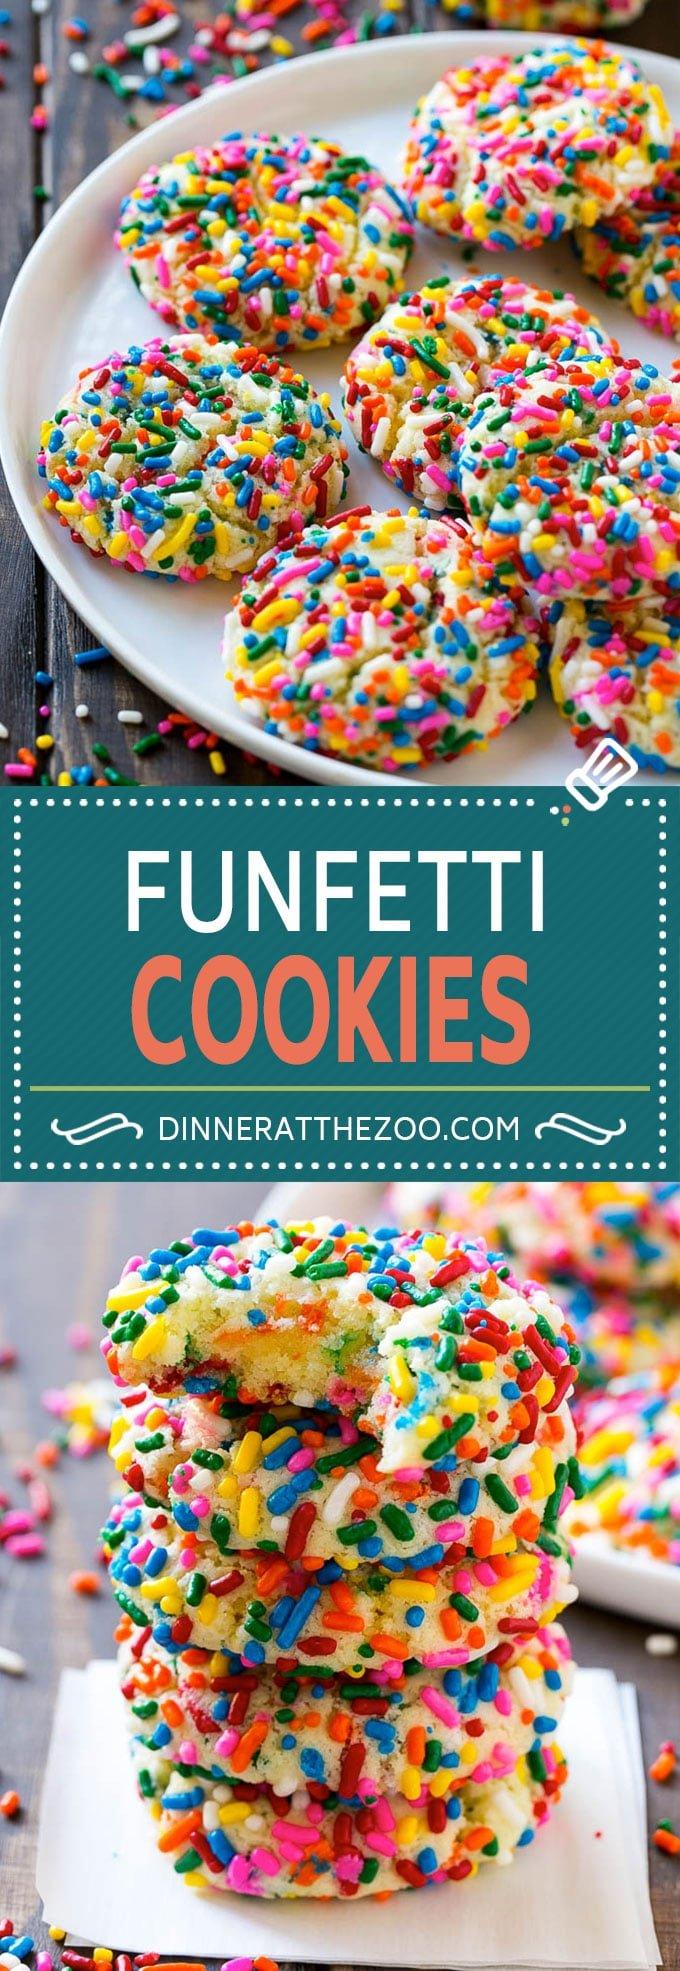 Funfetti Cookies Recipe | Funfetti Cake Mix Cookies | Sprinkle Cookies | Cake Mix Cookies #cookies #funfetti #sprinkles #dessert #dinneratthezoo